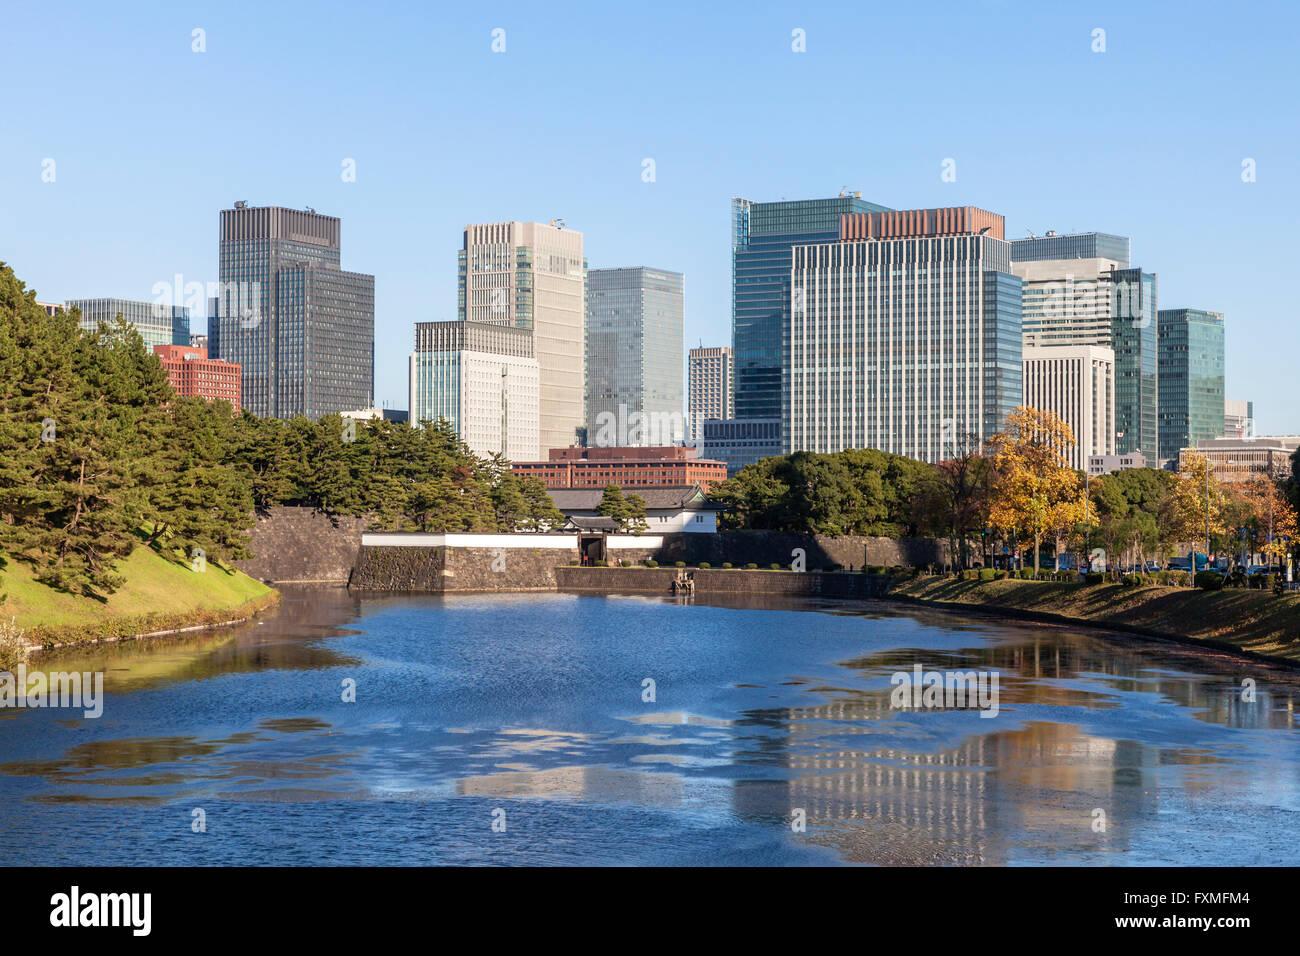 City view of Tokyo, Japan - Stock Image